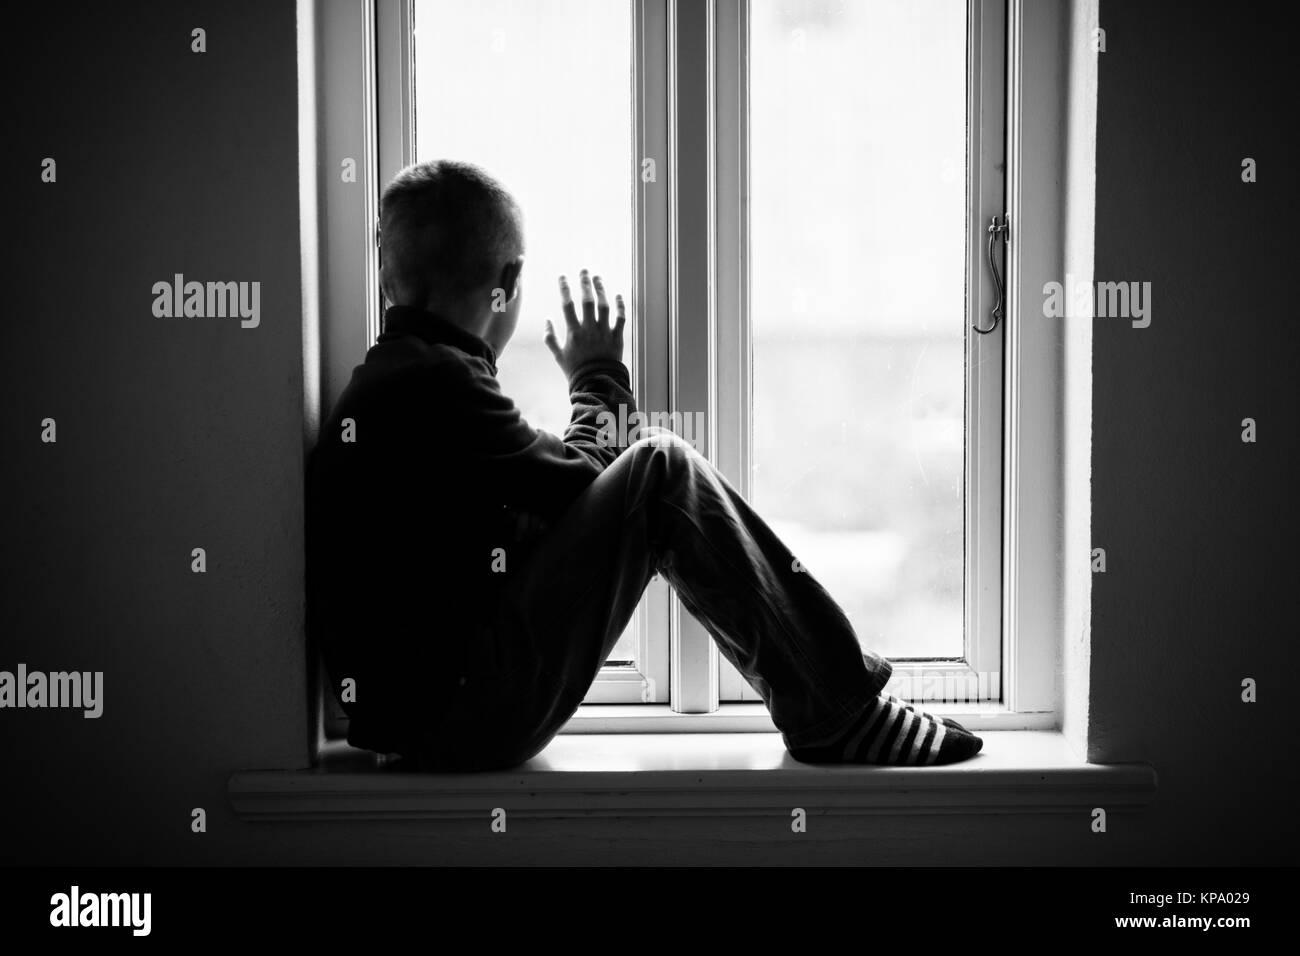 Boy Sitting on Windowsill While Looking Outside - Stock Image